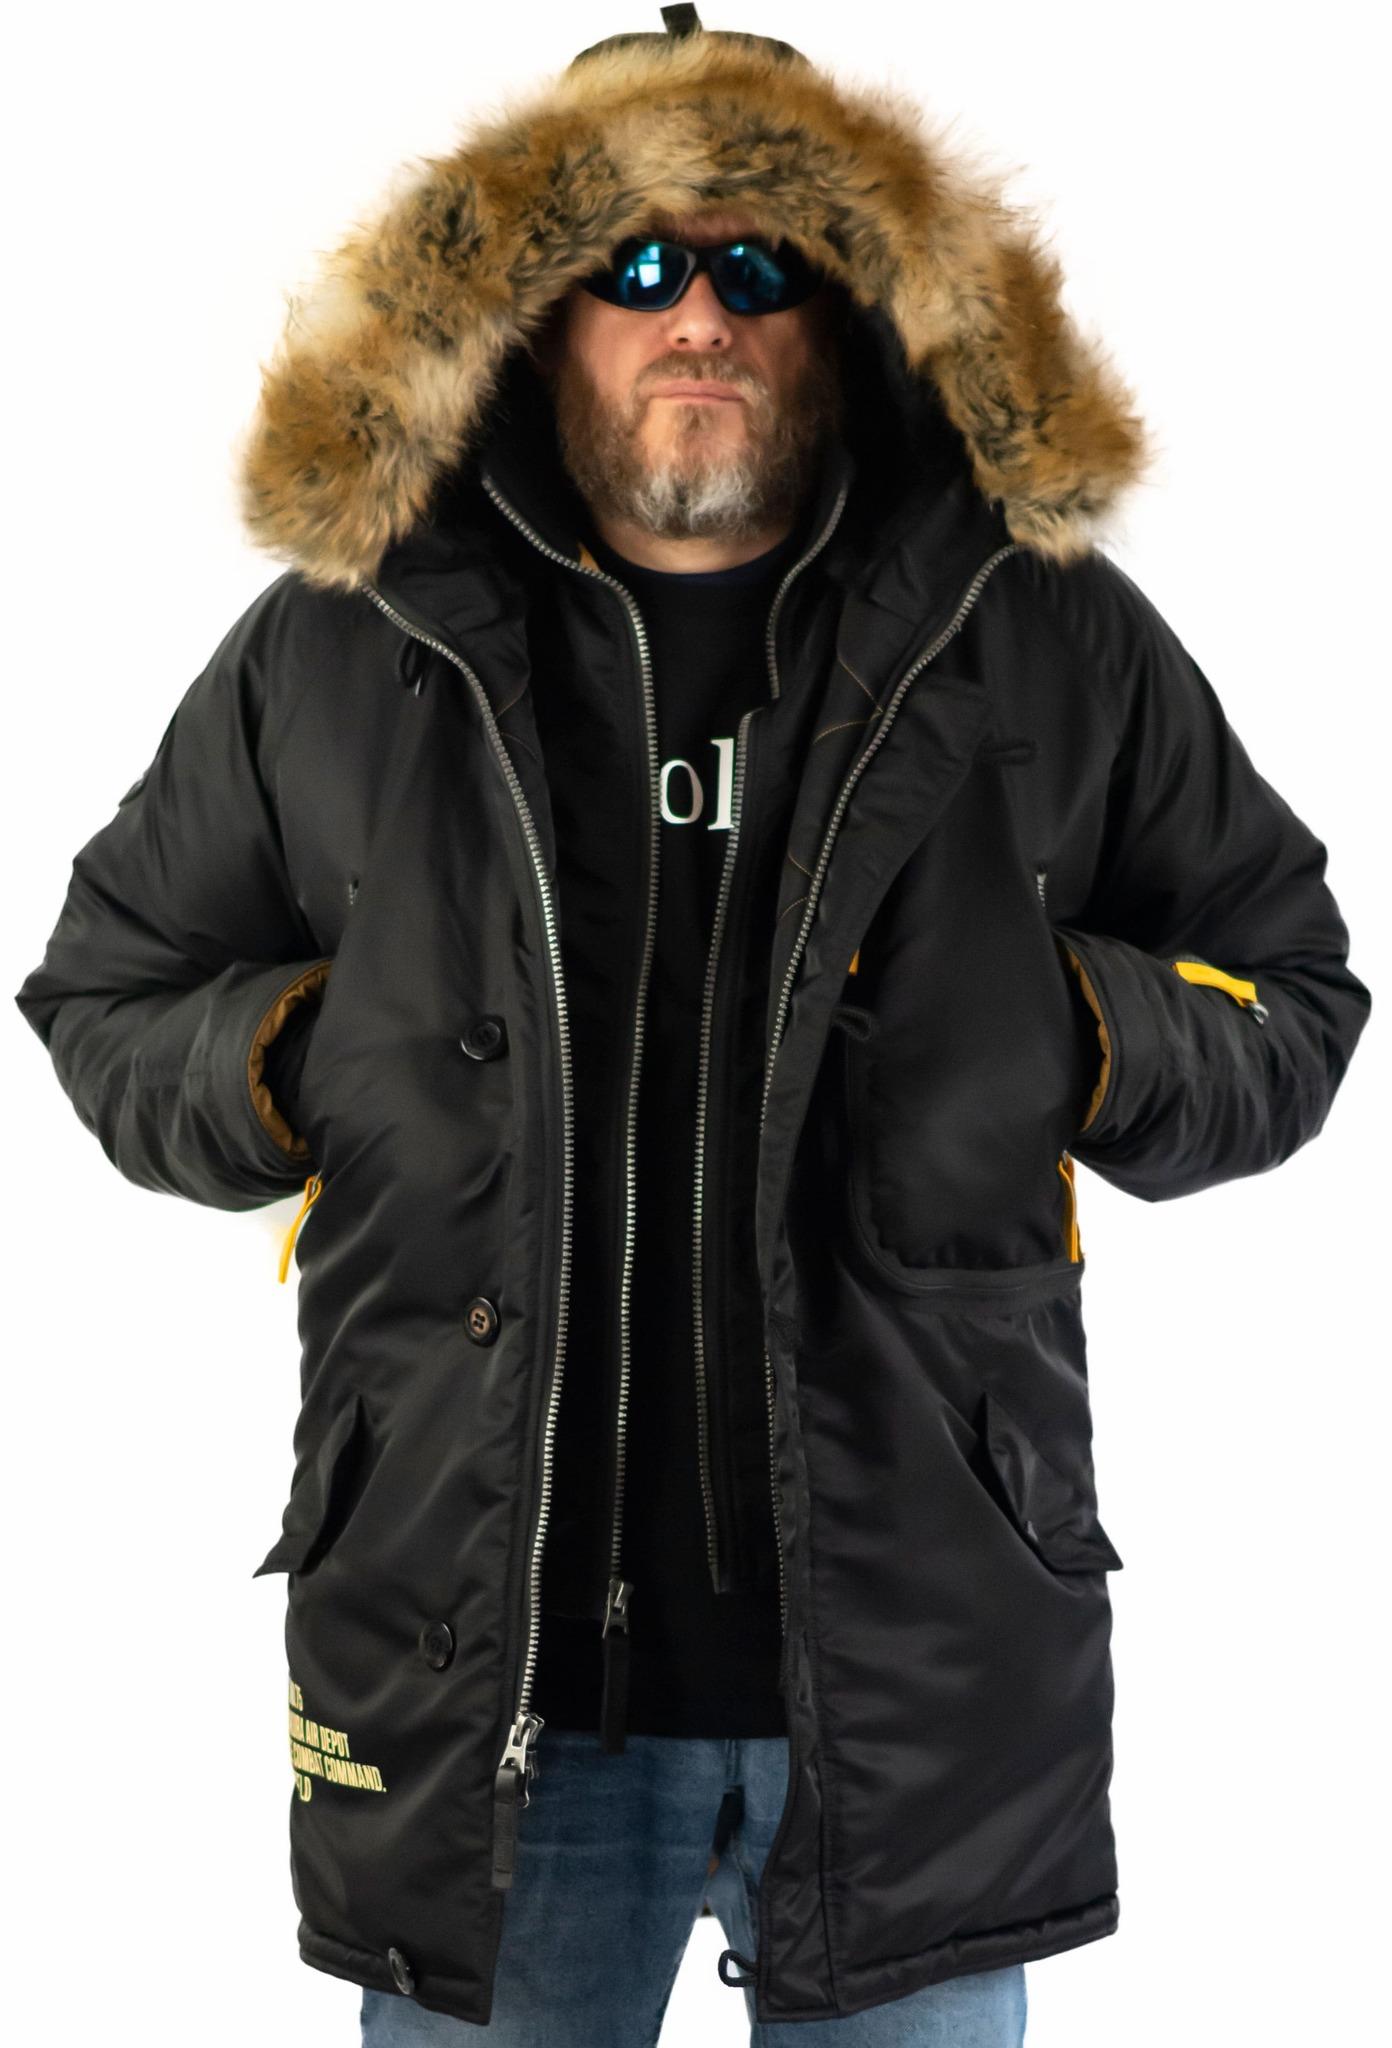 Куртка Аляска  Apolloget Expedition 2019 (черный/желтый - black/cinamon)